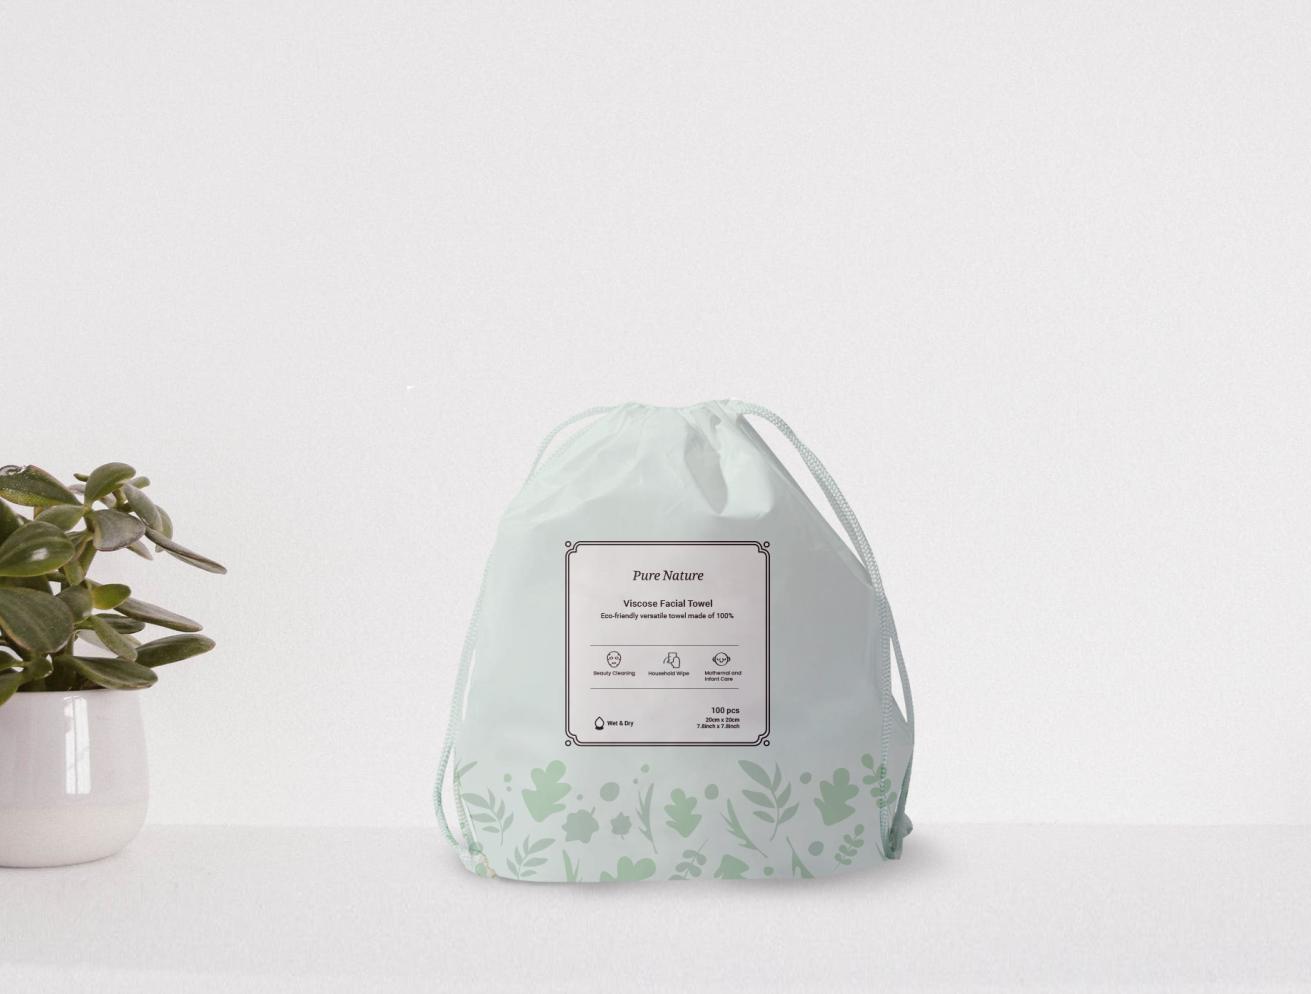 Disposable Face Towel-Biodegradable